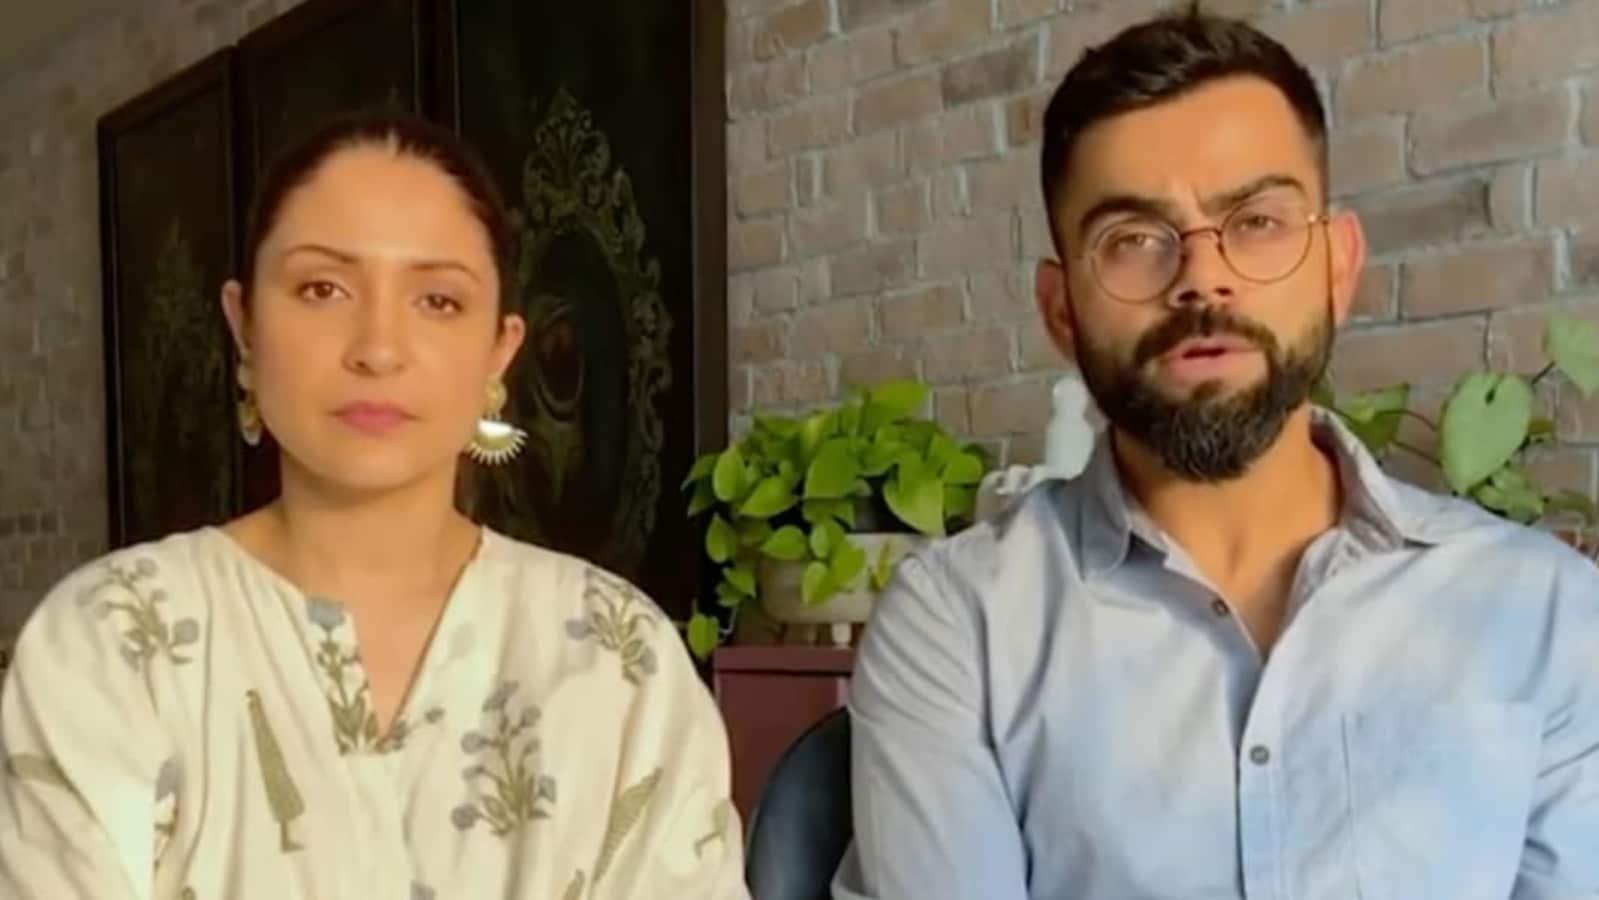 Anushka Sharma-Virat Kohli's Covid-19 fundraiser generates ₹3.8 crore in a  day, ₹2 crore came from couple | Bollywood - Hindustan Times